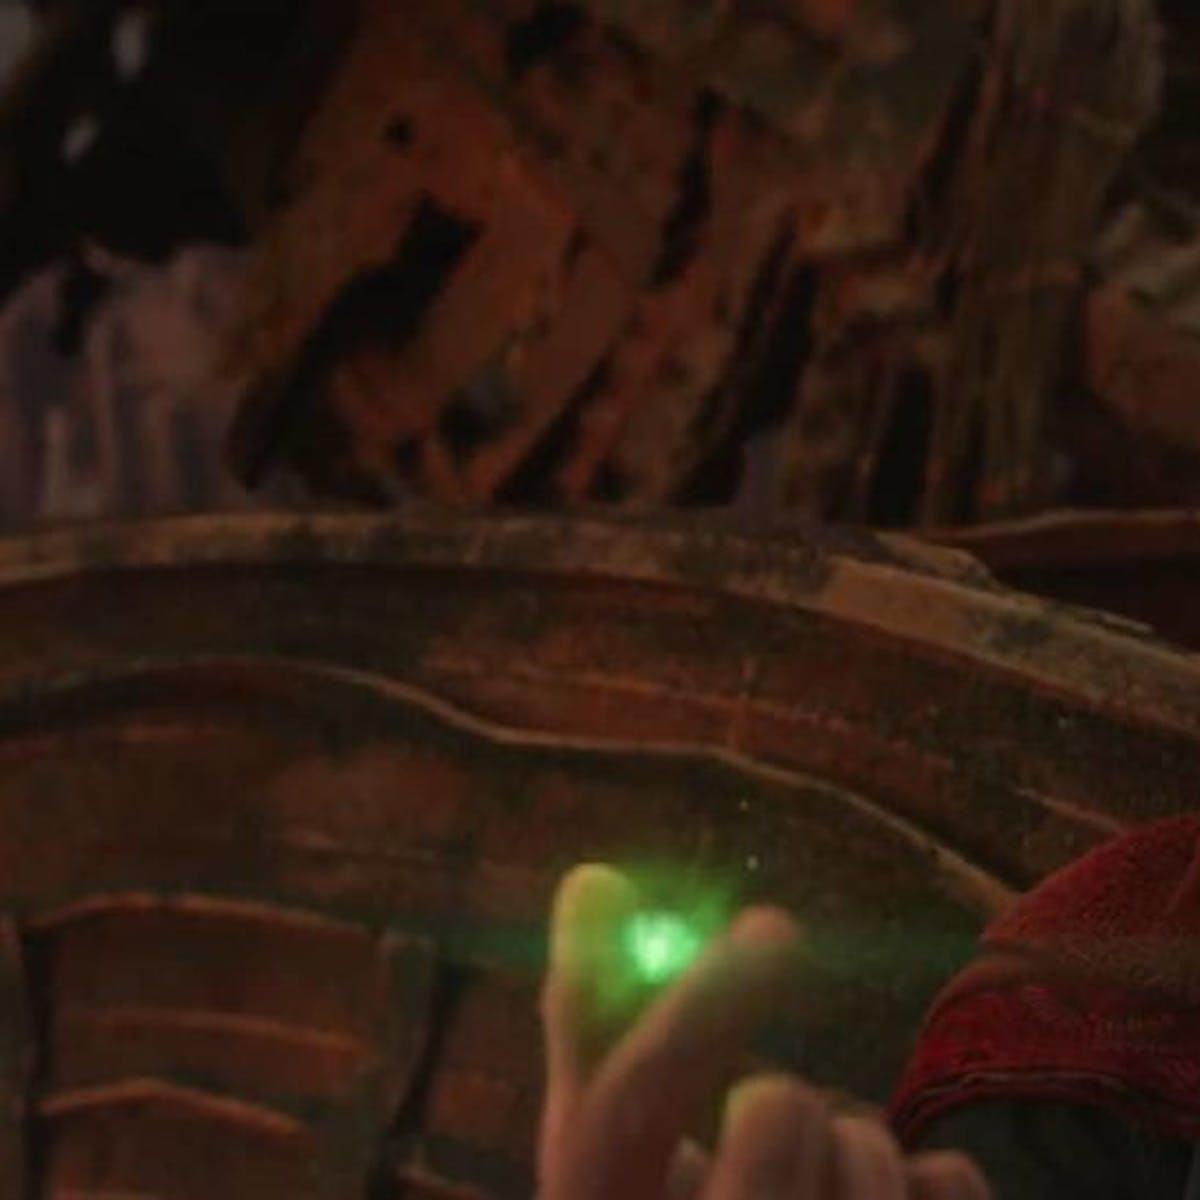 'Avengers 4: Endgame' Spoilers: Time Loop Twist Revealed in Old Interview